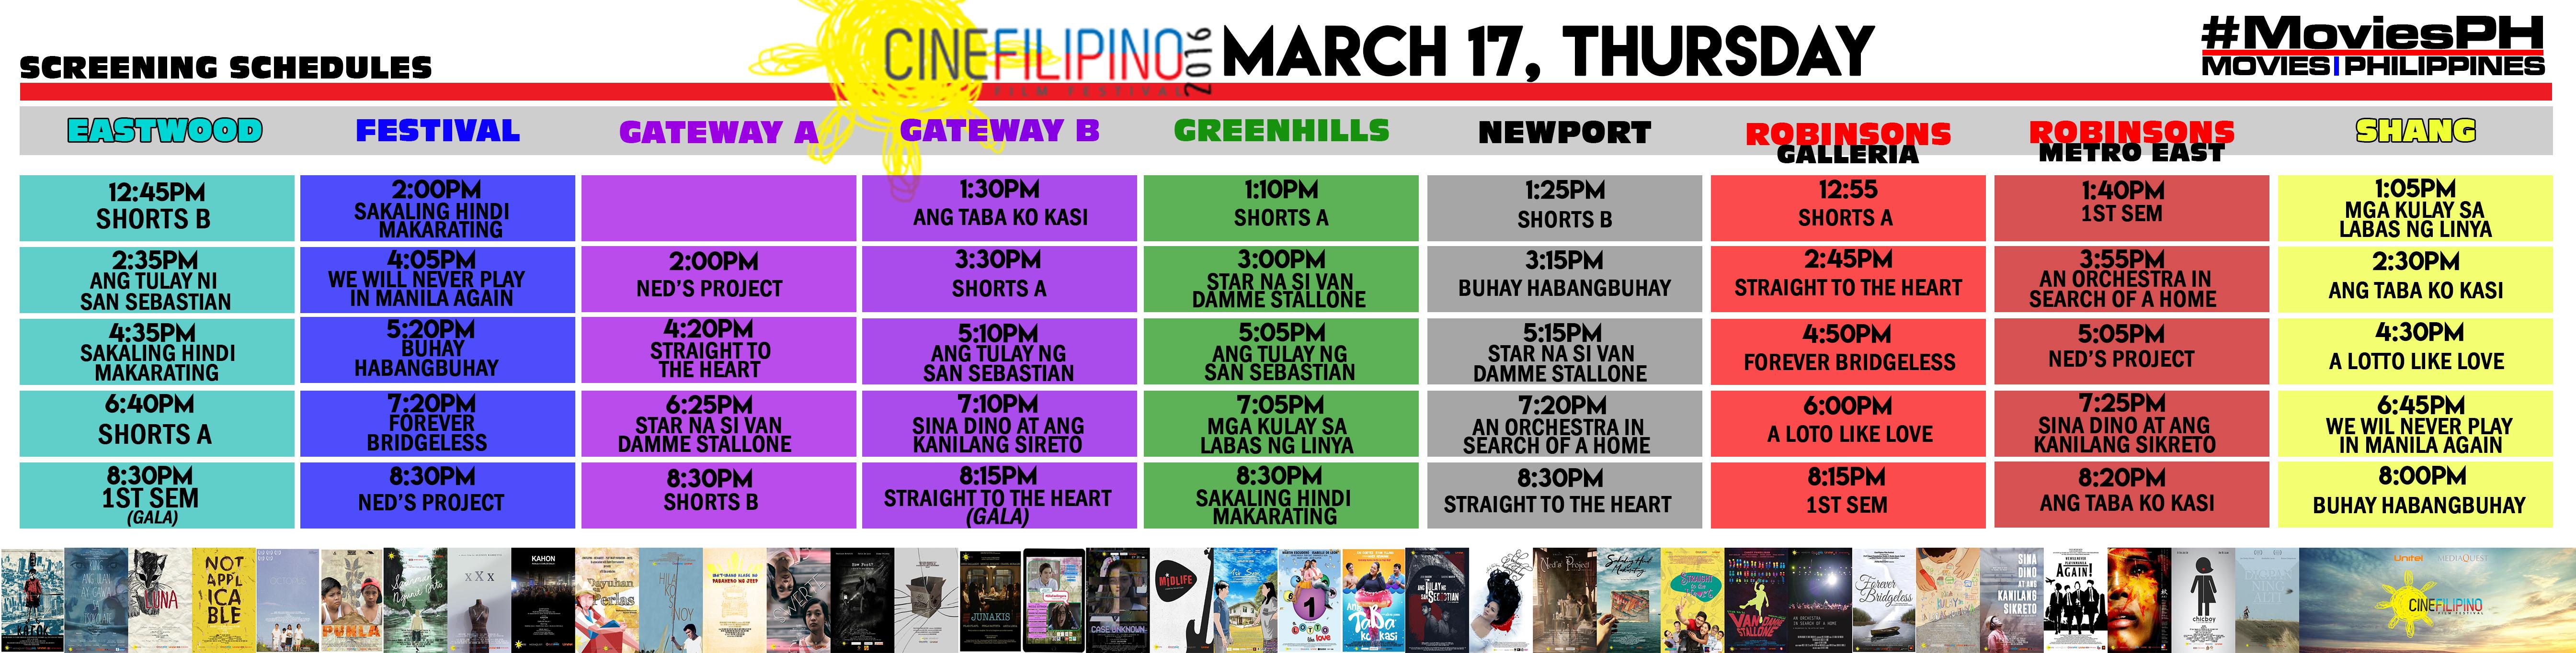 CineFilipino Sked March 17